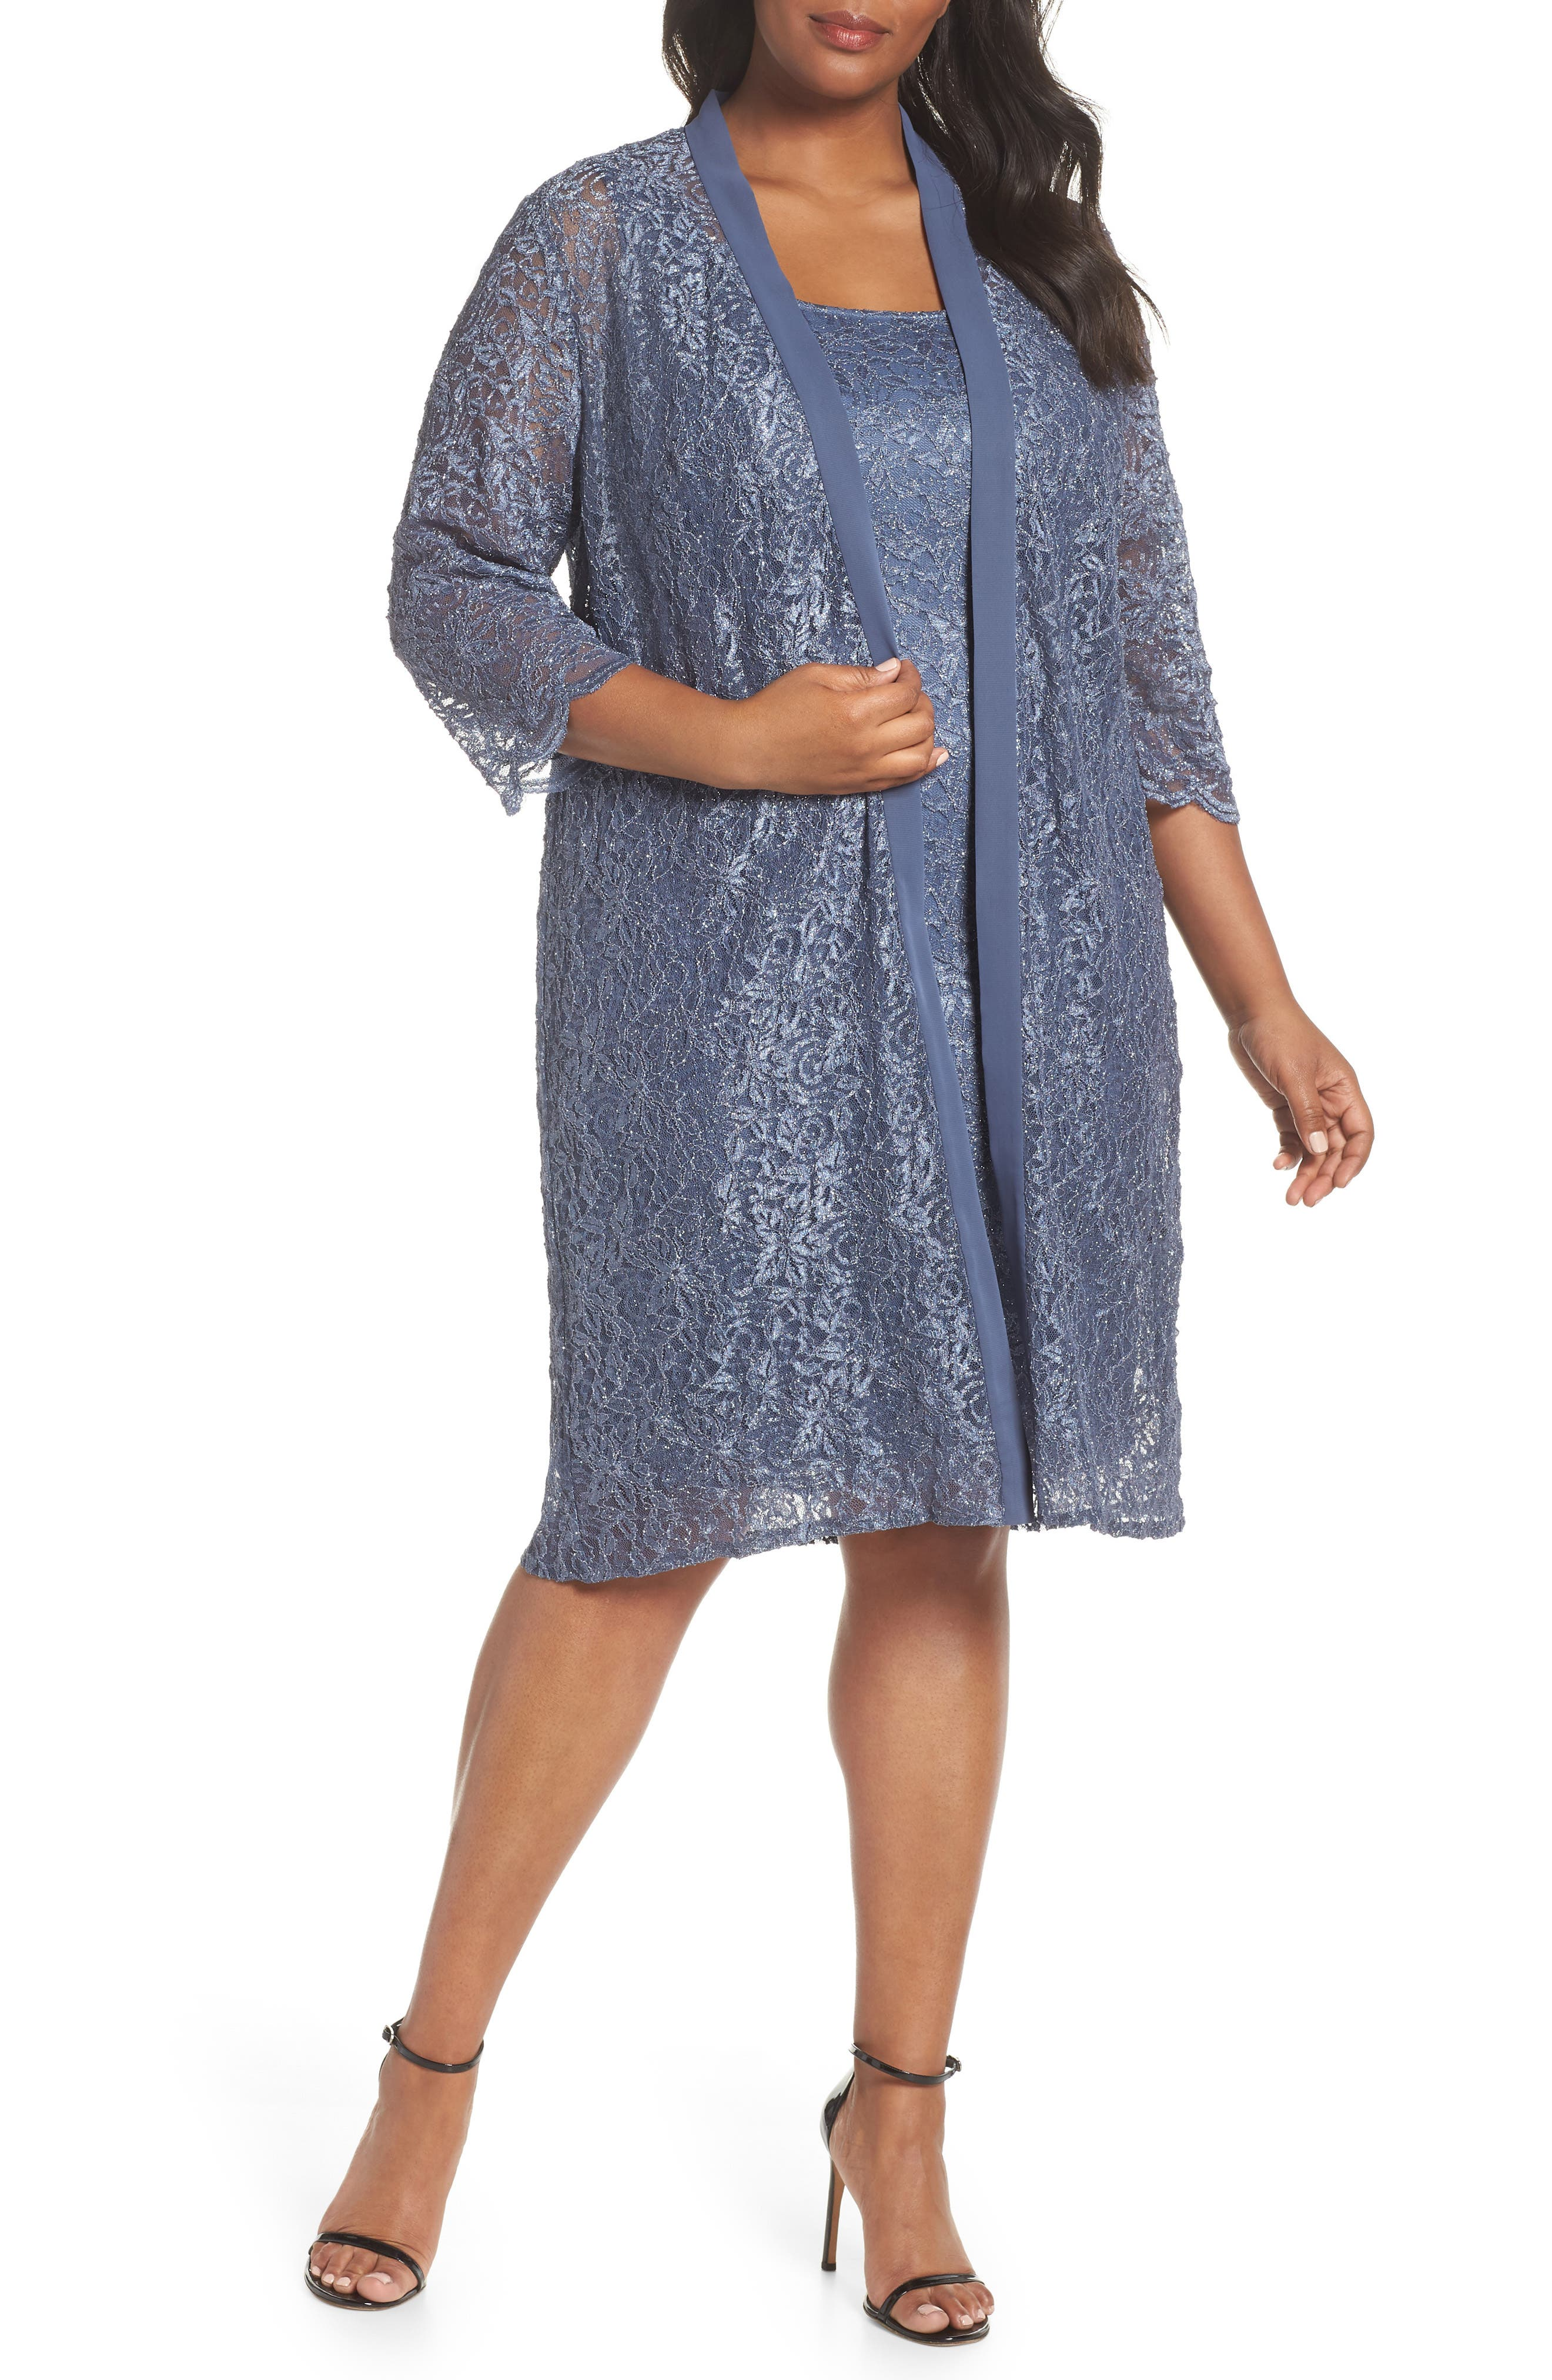 Plus Size Alex Evenings Lace Sheath Dress With Jacket, Grey